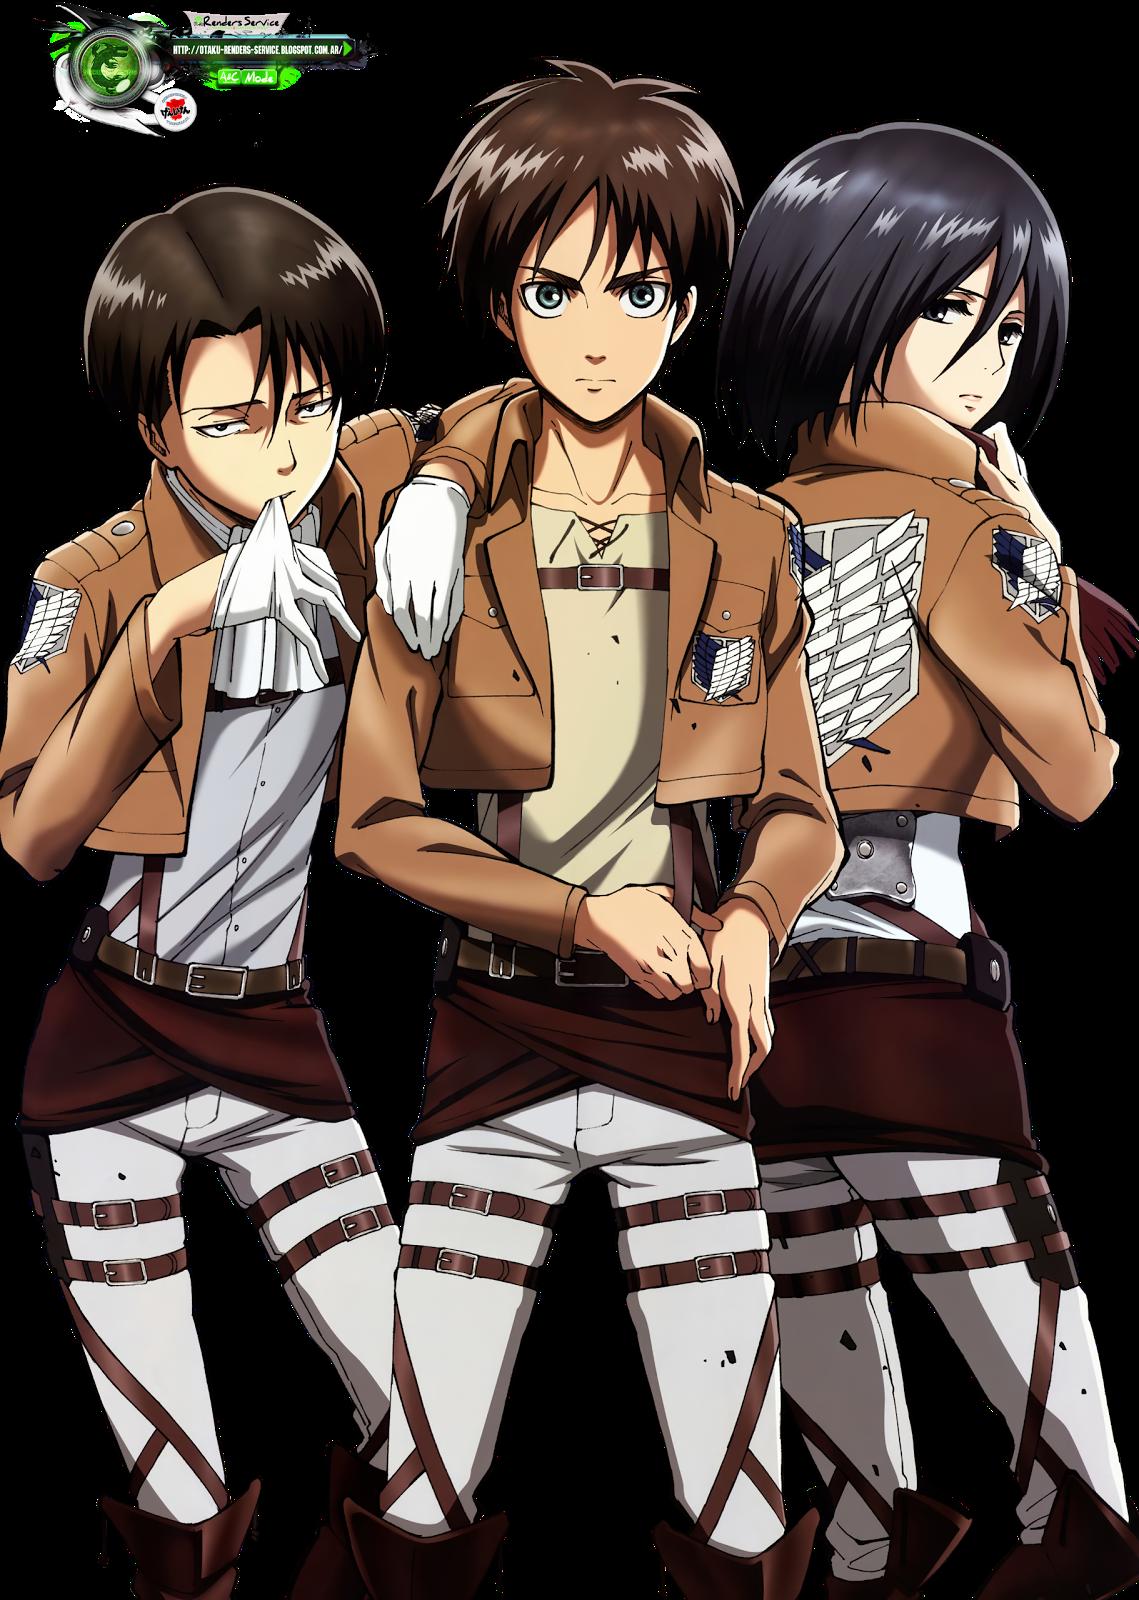 Levi Eren Mikasa Attack On Titan Anime Attack On Titan Eren Attack On Titan